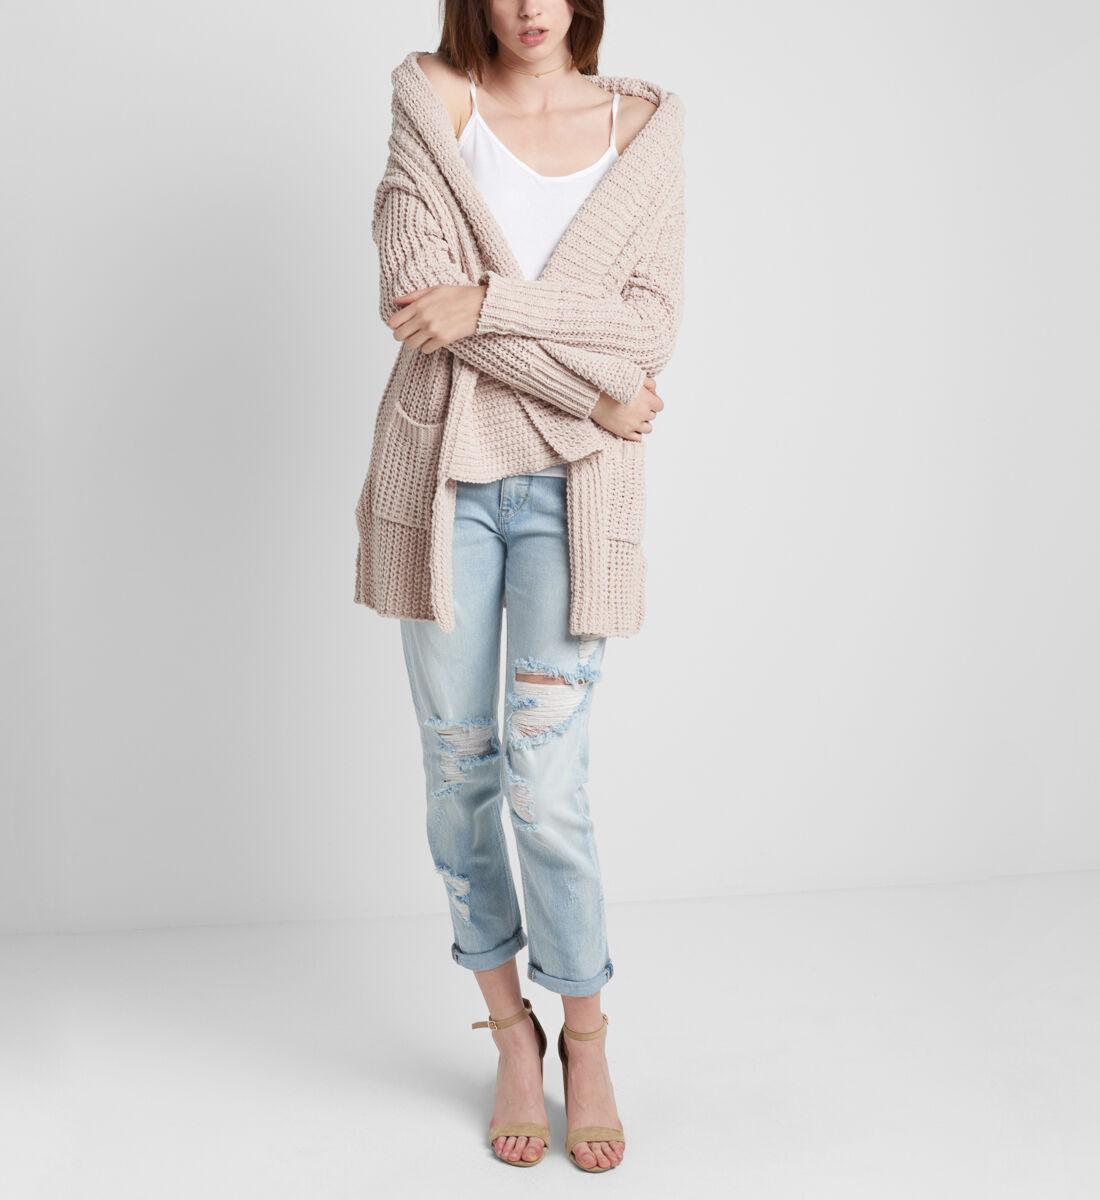 Pacie Sweater Alt Image 1